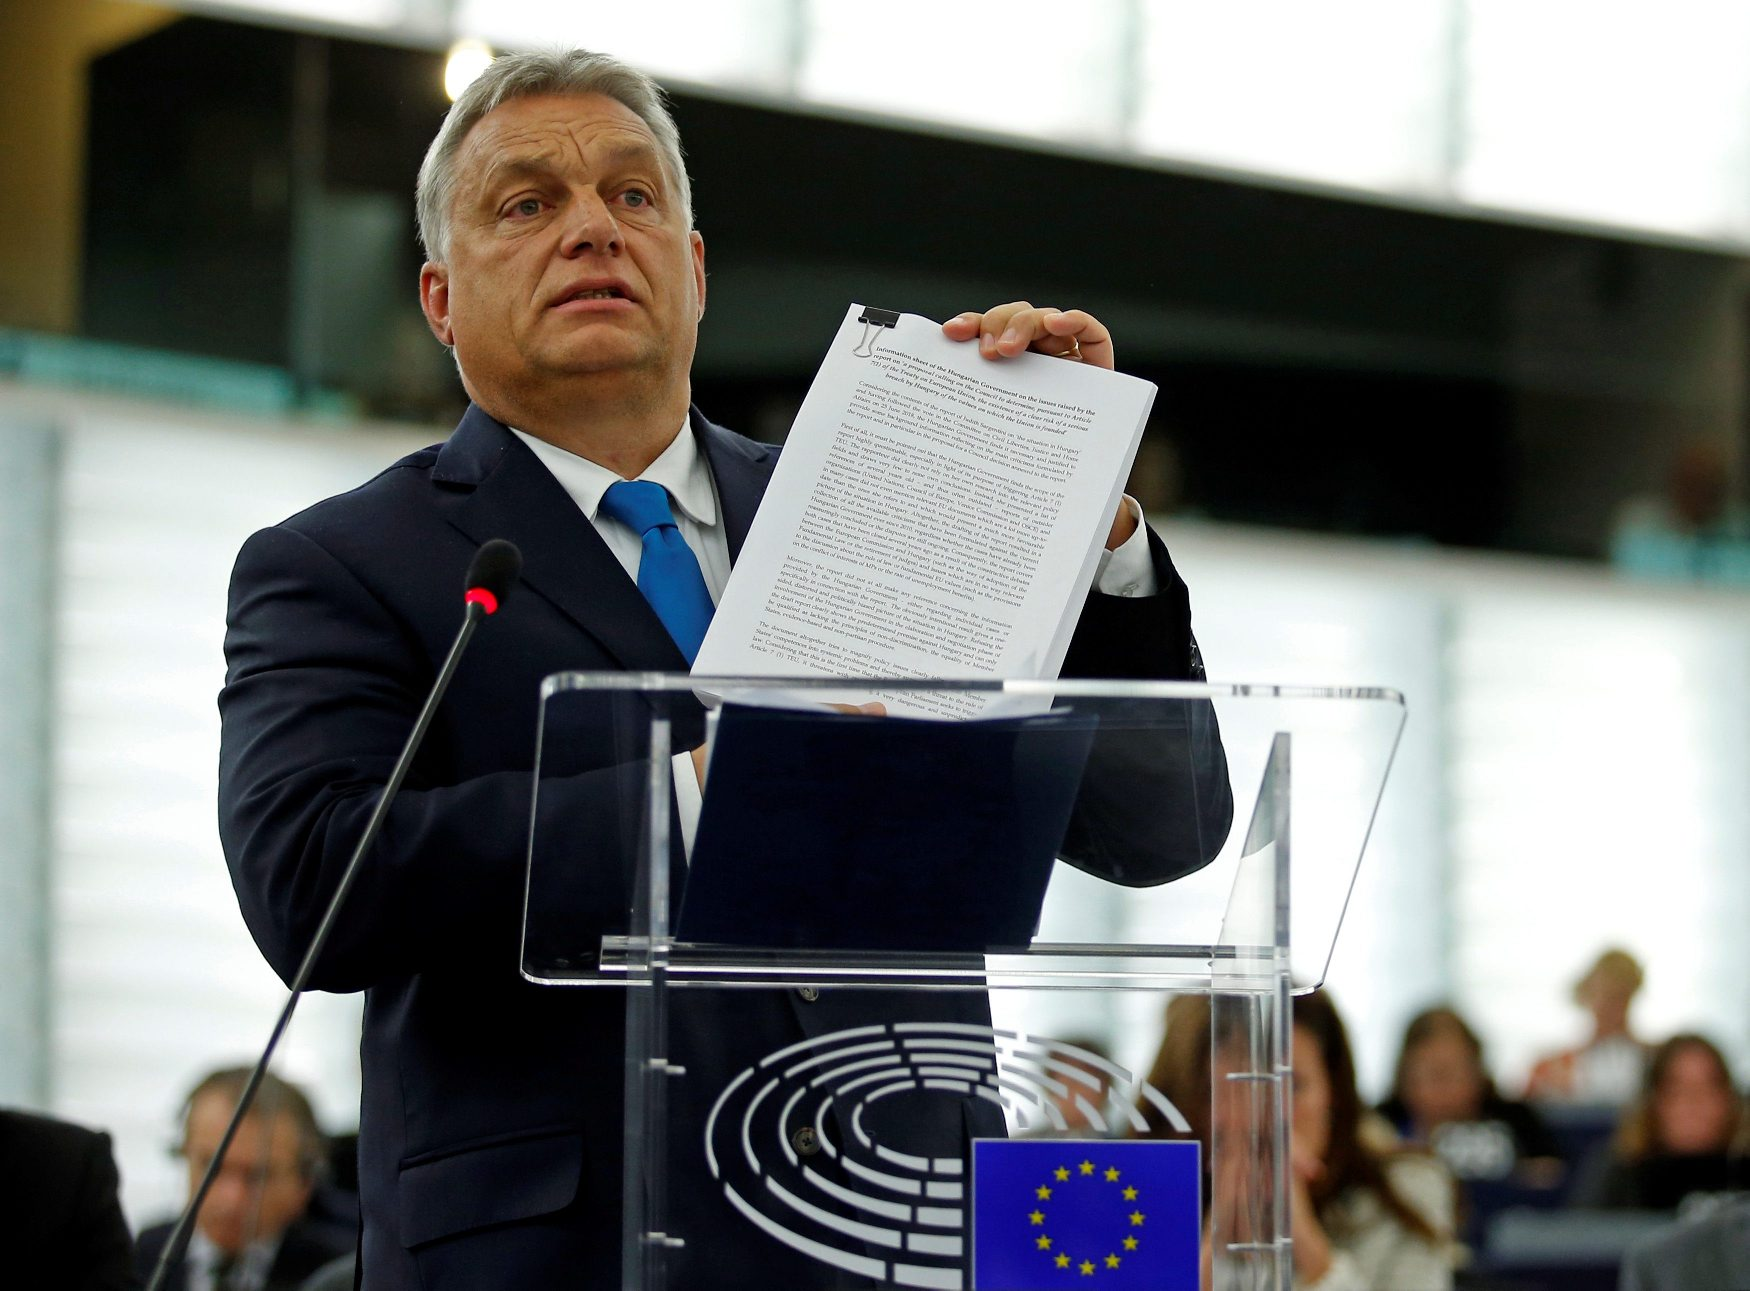 2018-09-11T160830Z_995834053_RC13277AE900_RTRMADP_3_EU-HUNGARY